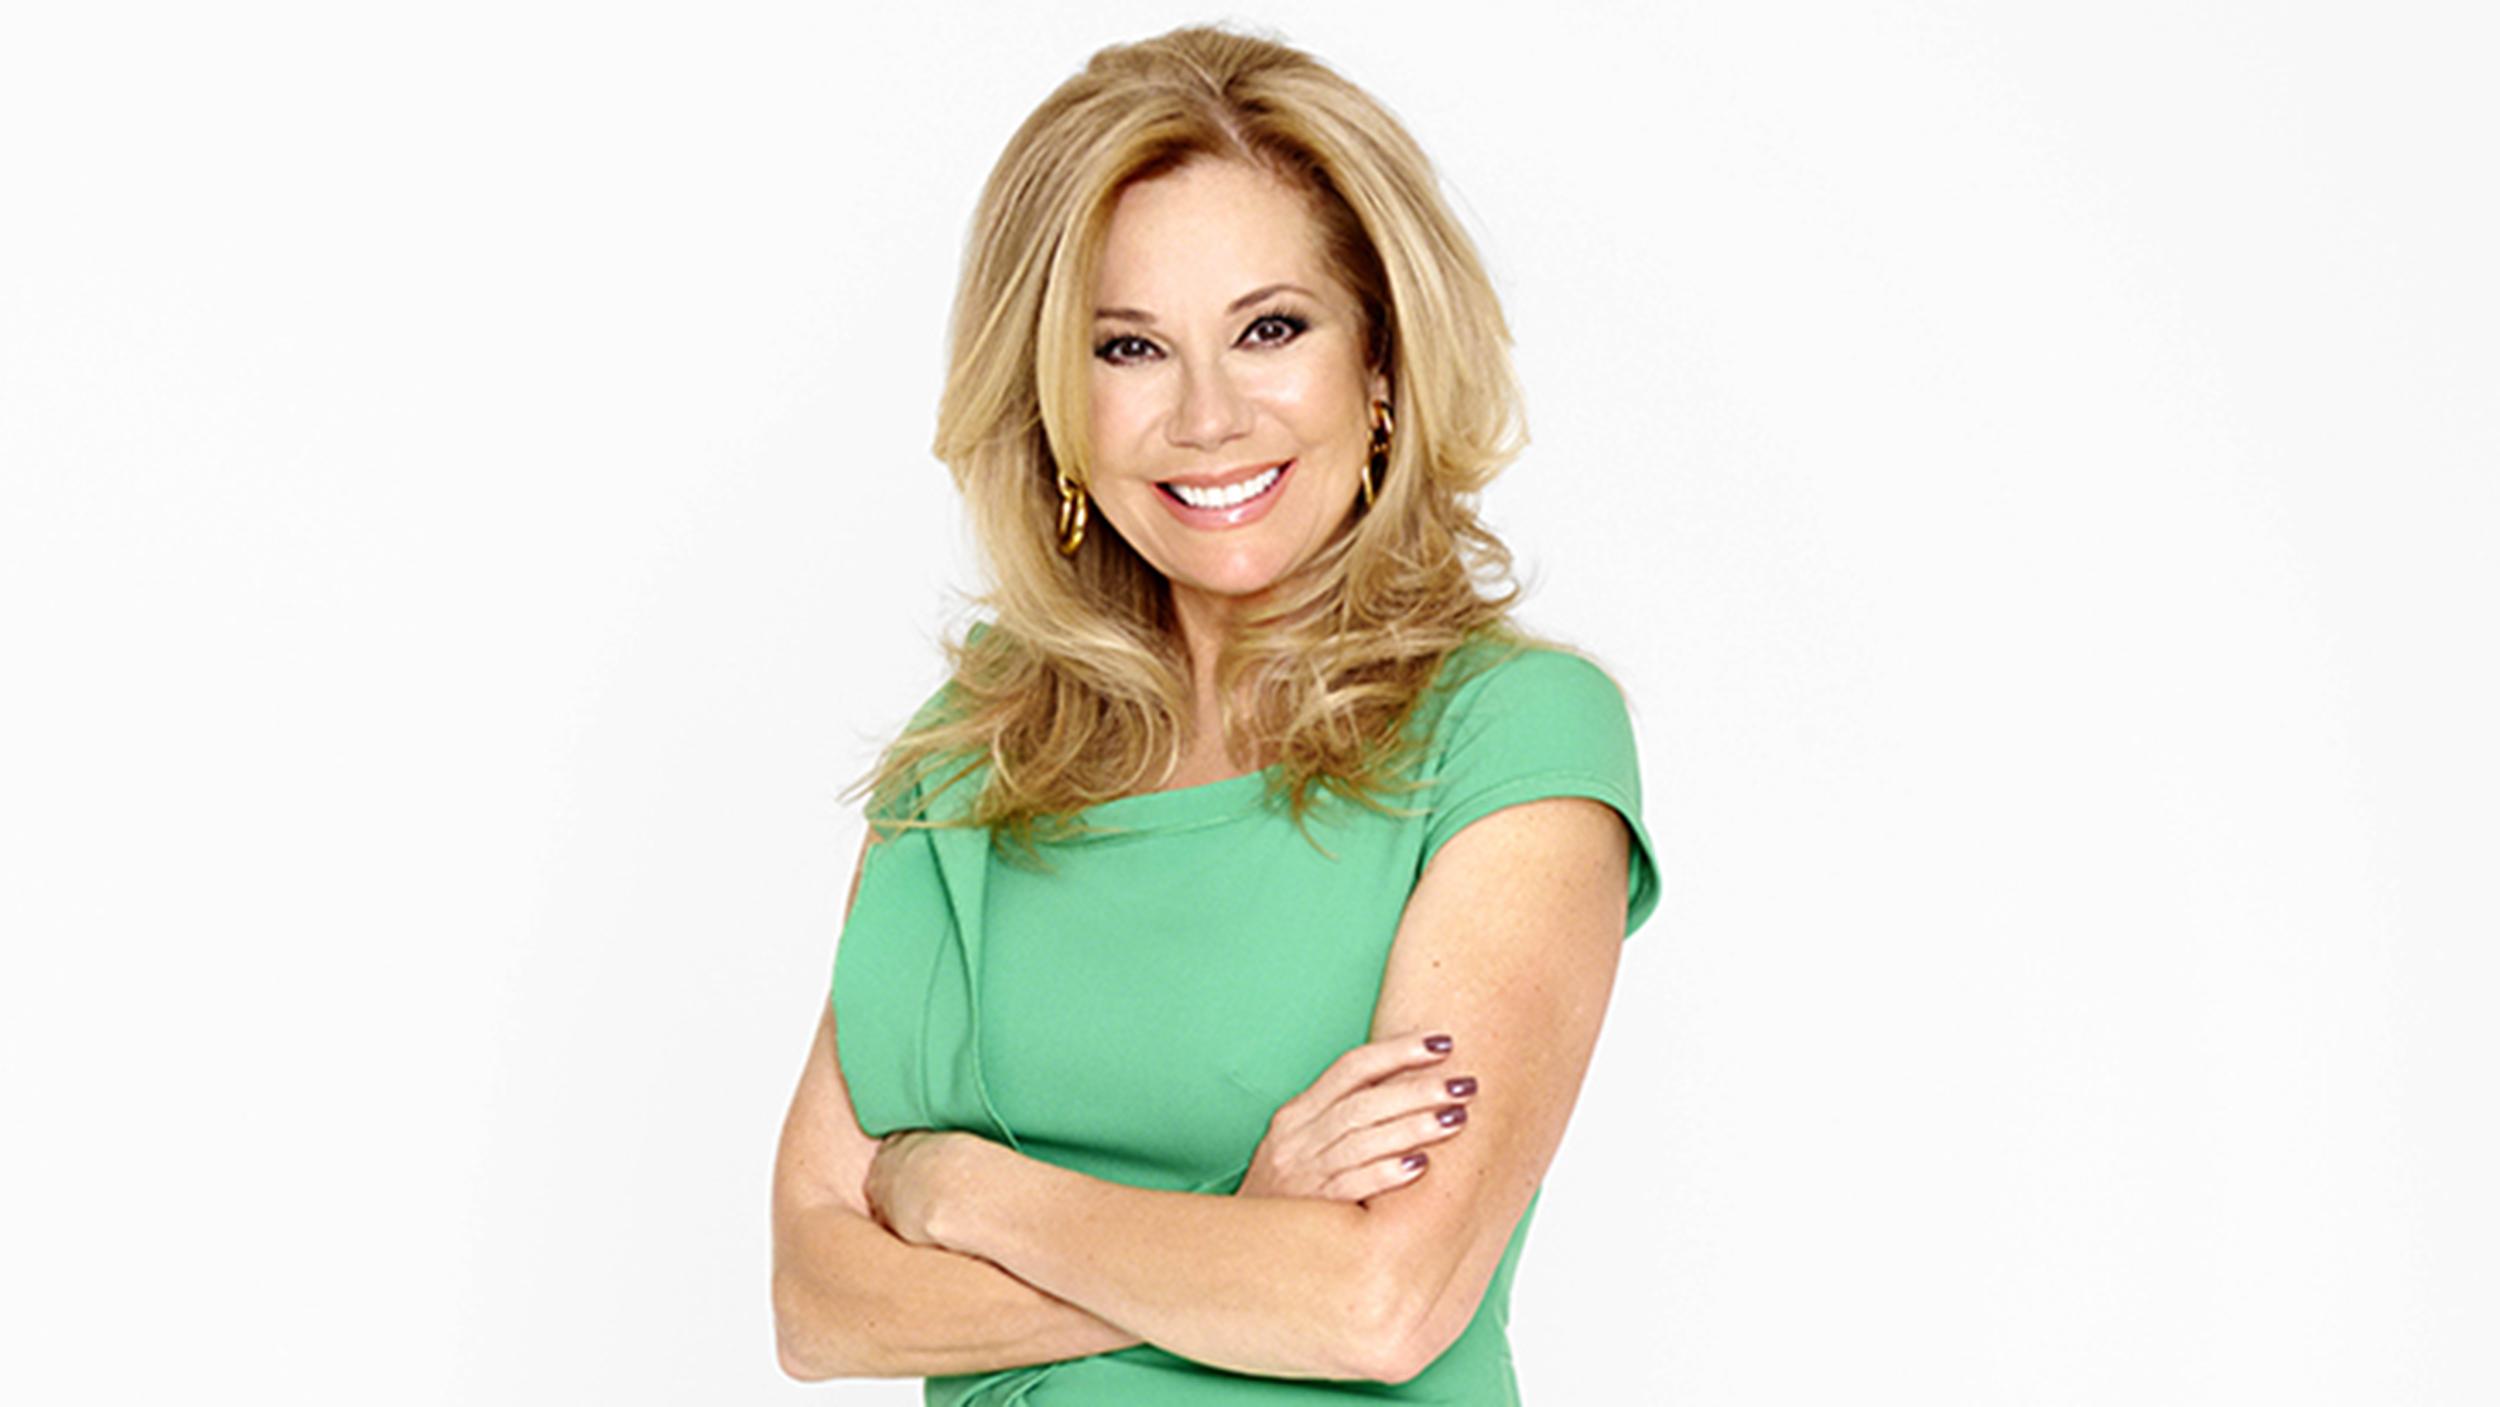 Kathie Lee Gifford Hairstyle Kathie Lee Gifford Co-host of